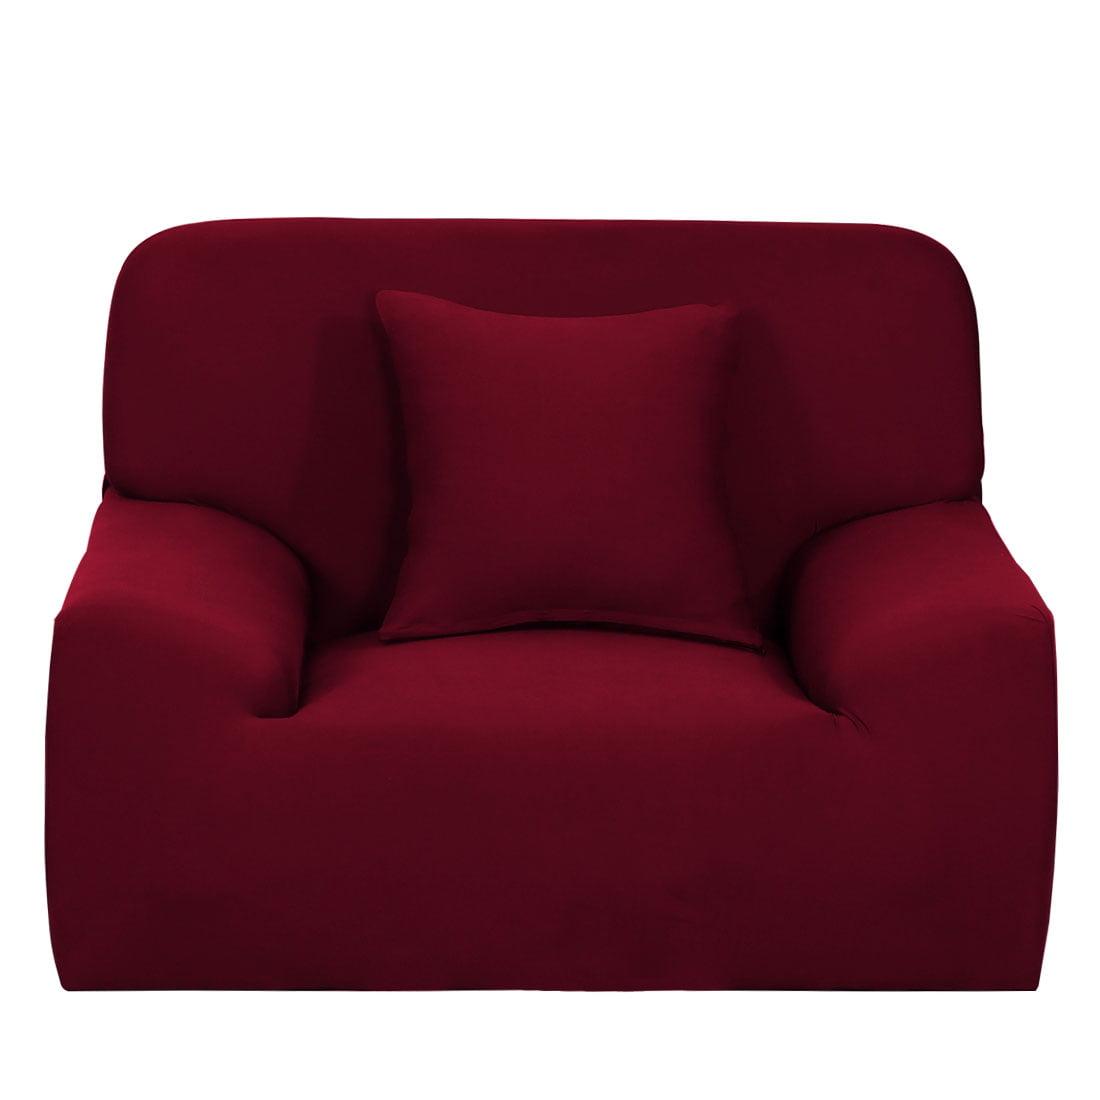 Piccocasa Furniture Sofa Chair Couch Stretch Cover